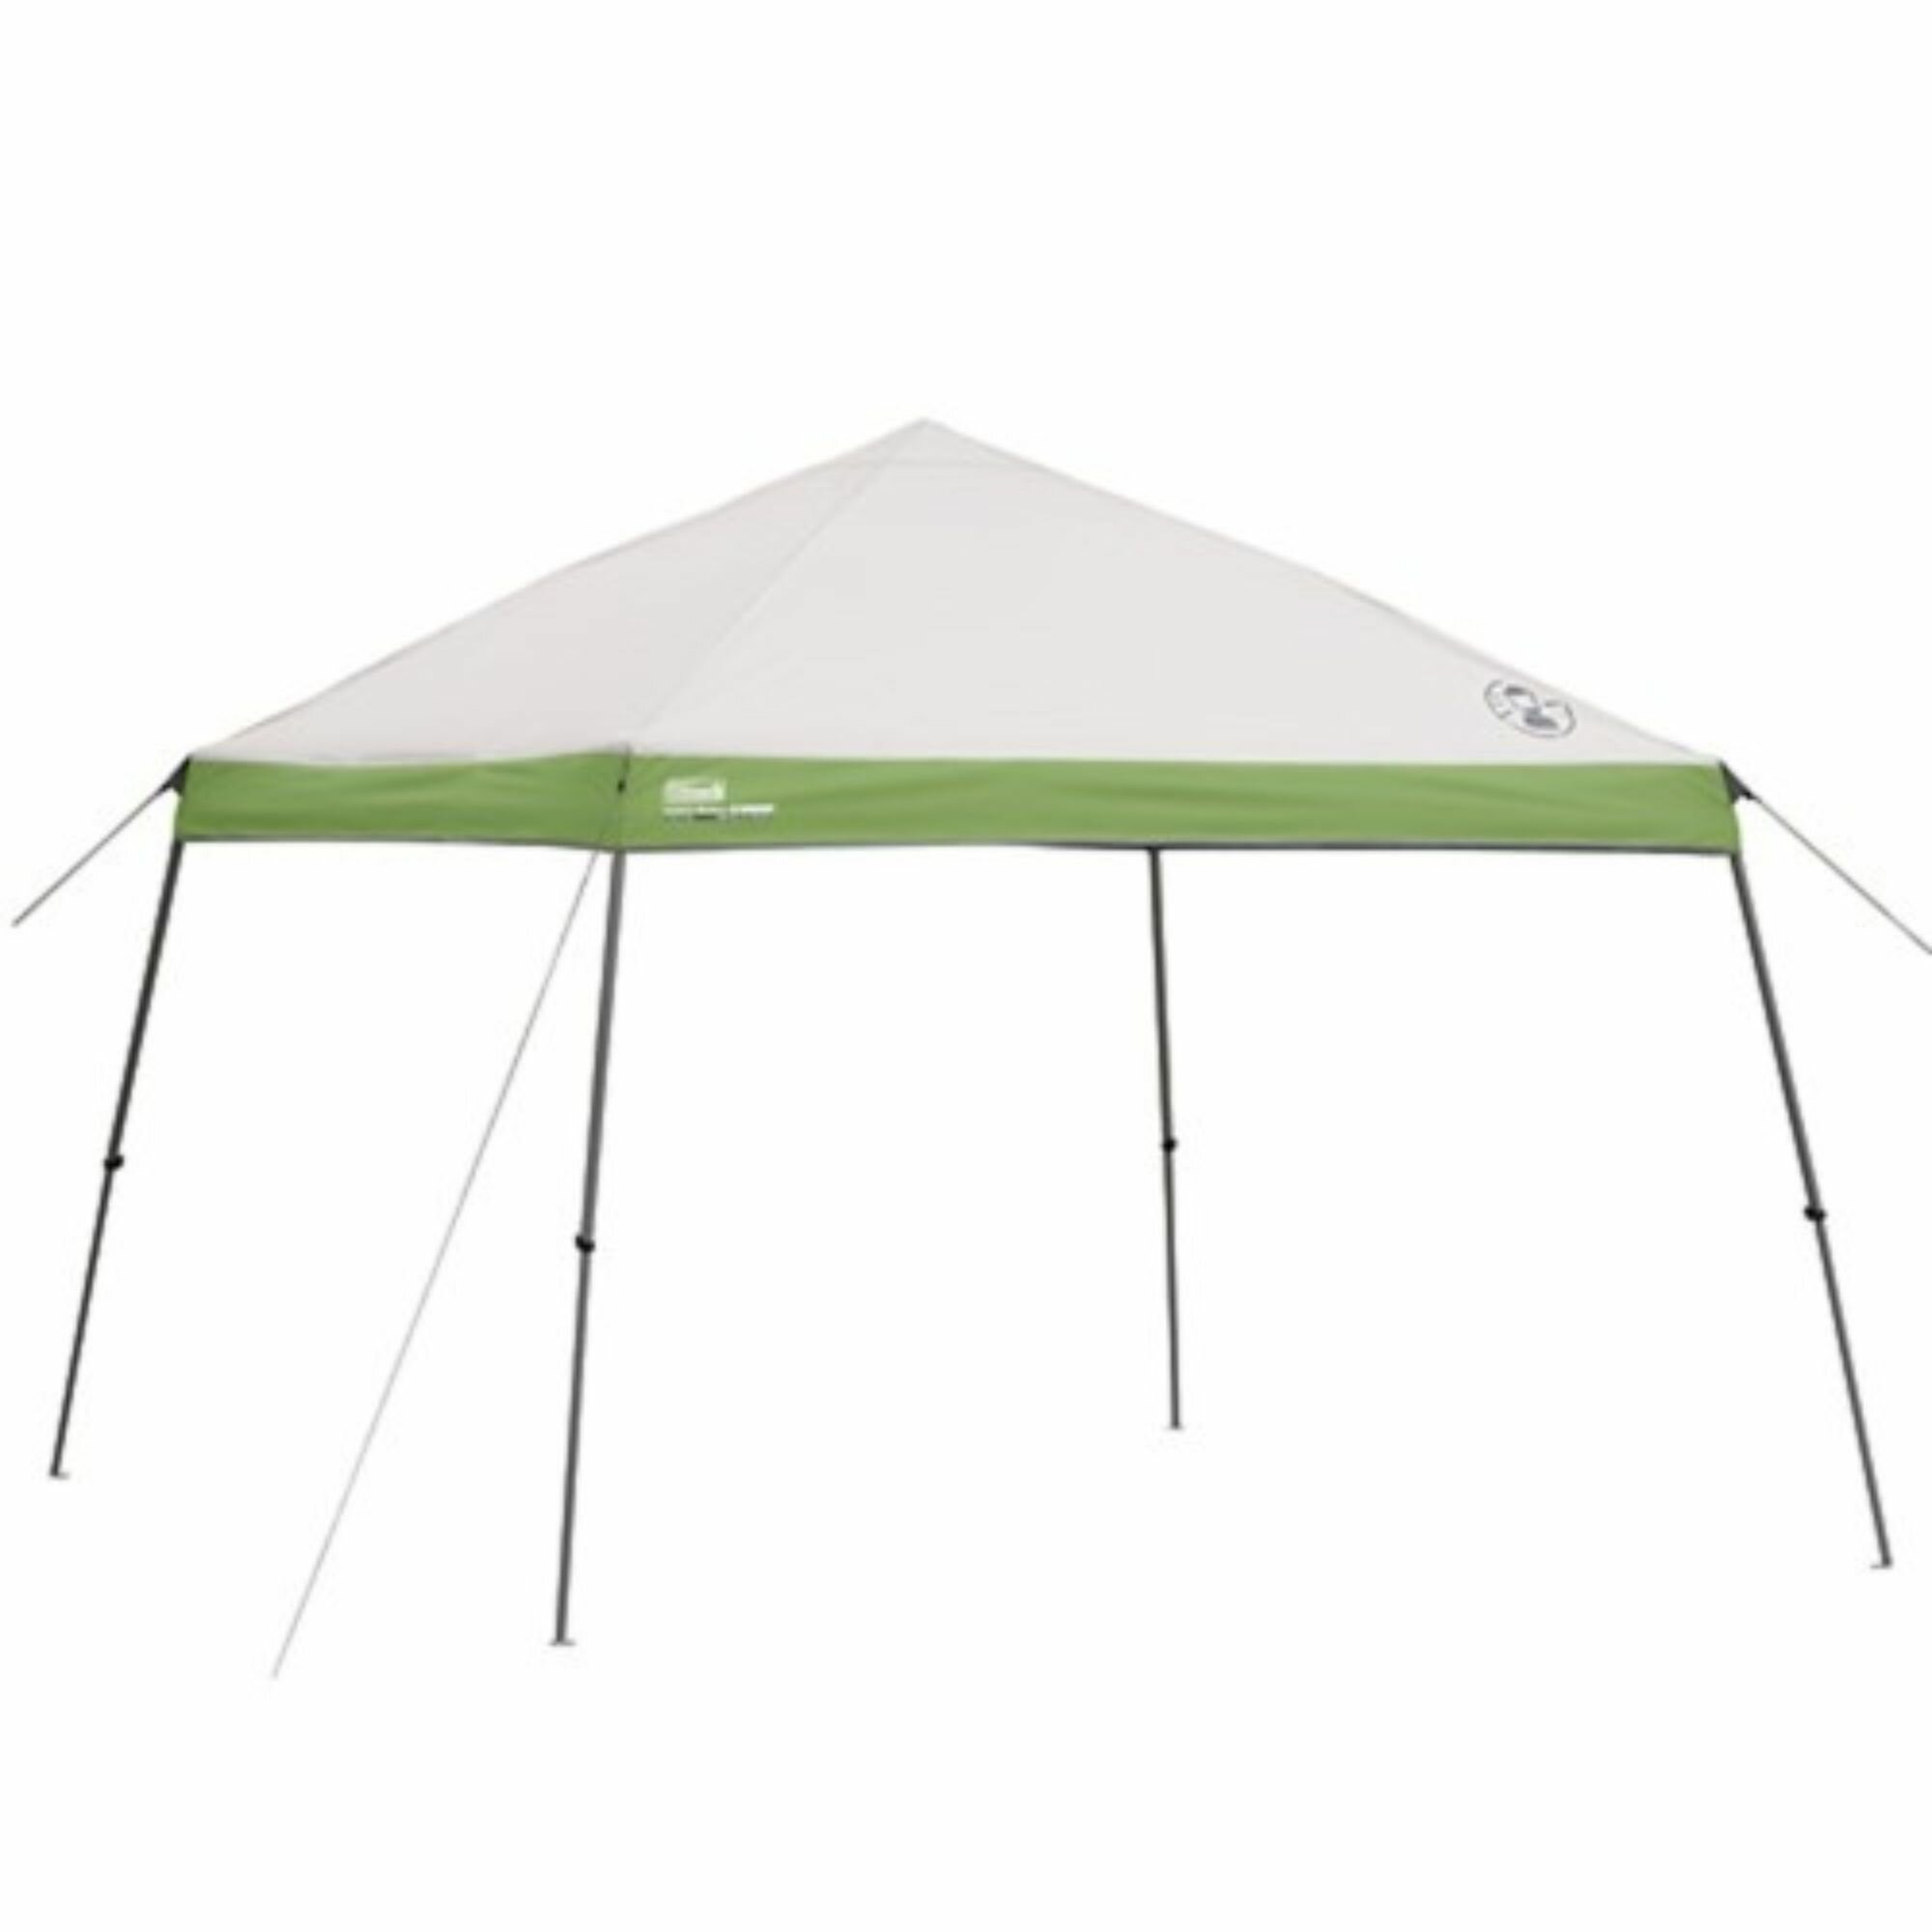 san francisco ad836 29285 10 Ft. W x 10 Ft. D Steel Pop-Up Canopy